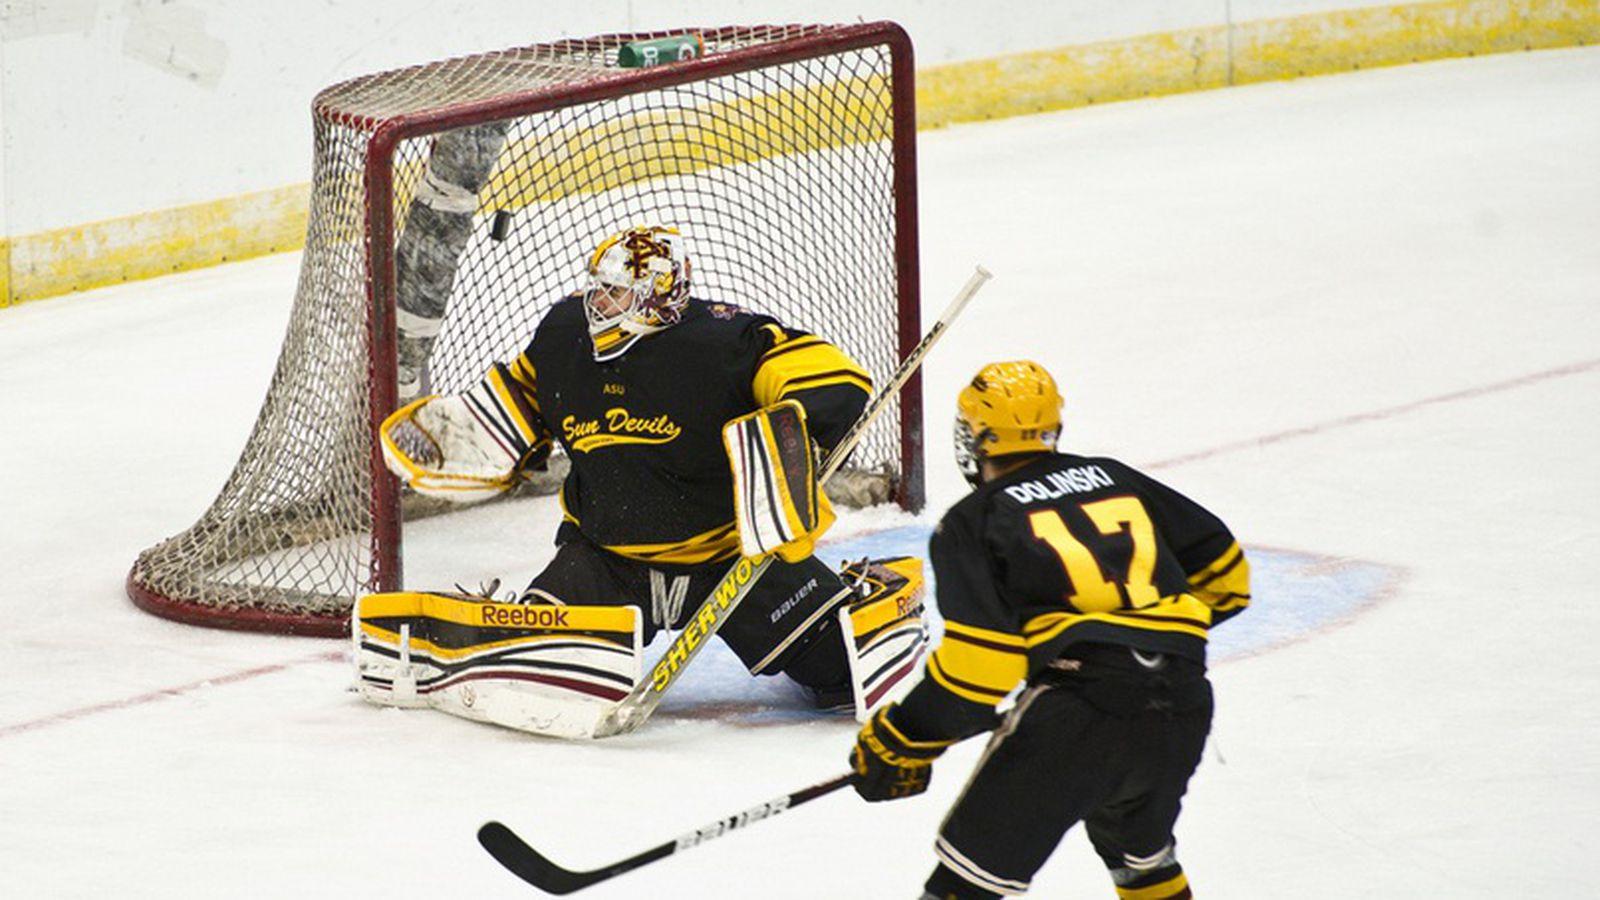 ASU Hockey Signs Elite Goaltender Robert Levin - House of Sparky